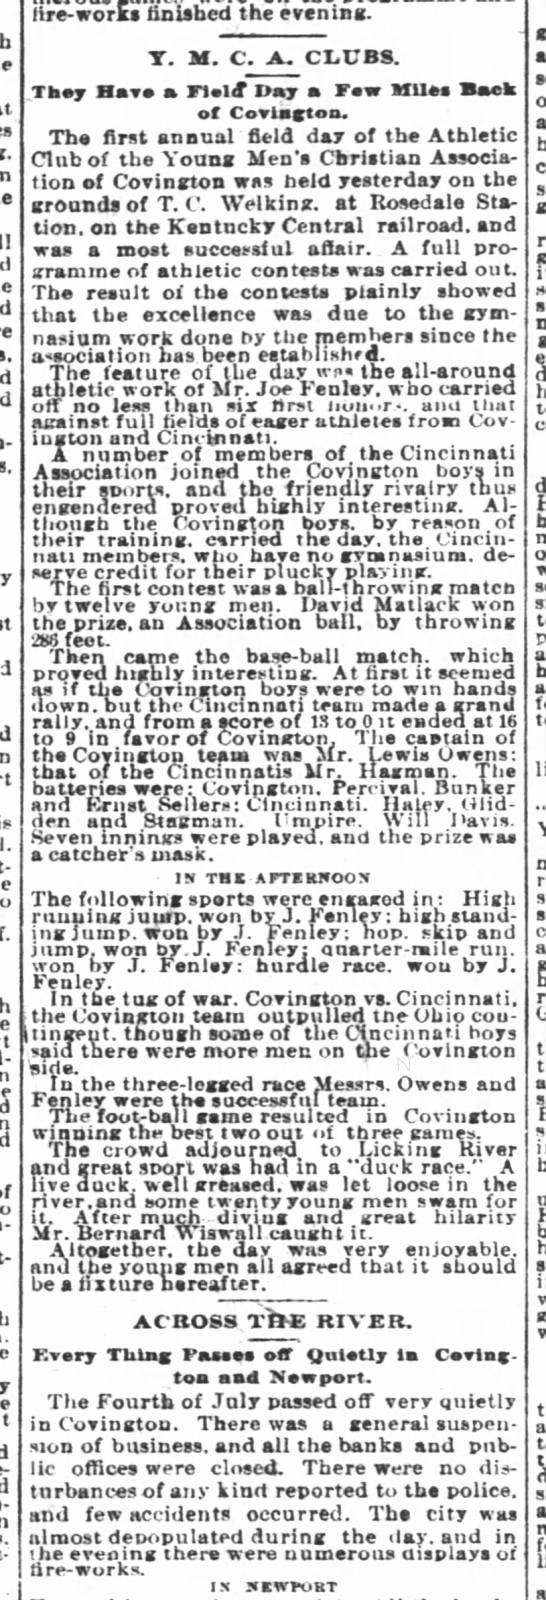 Cincinnati Enquirer 5 July 1889 - is pent-up hard-ooking cart-r.dge whole-Bale...